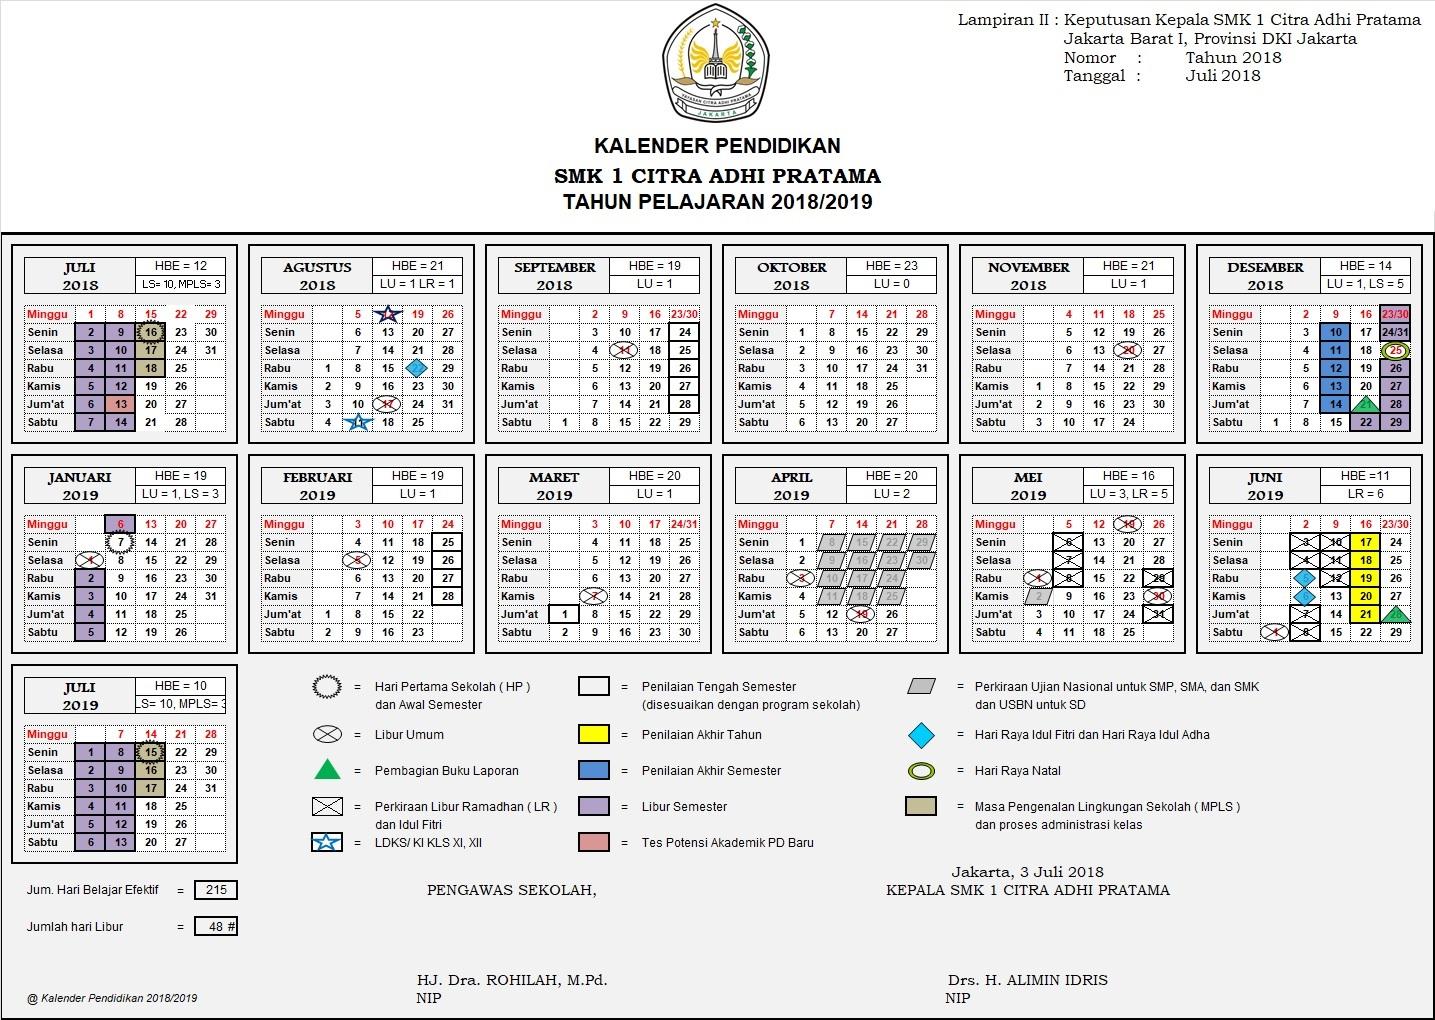 Kalender Pendidikan SMK 1 Citra Adhi Pratama Jakarta